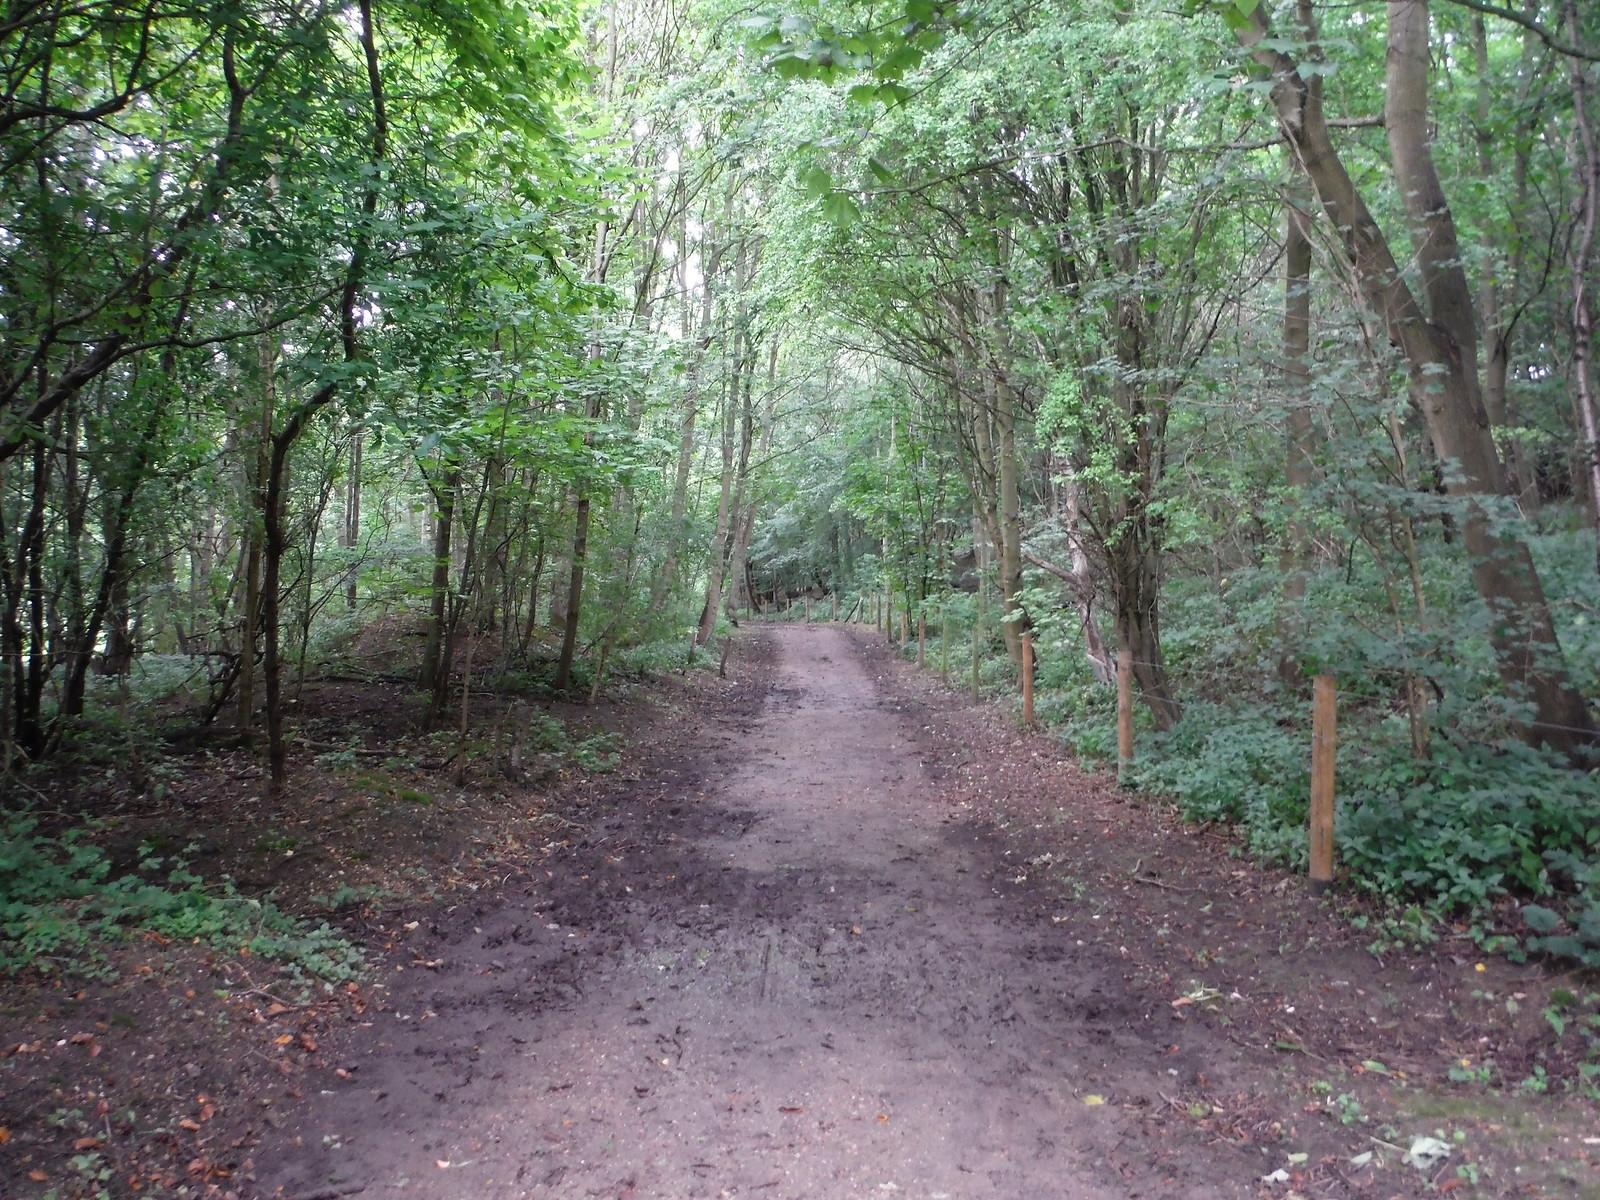 Through Mill Wood SWC Walk 164 Roydon to Sawbridgeworth via Henry Moore Foundation